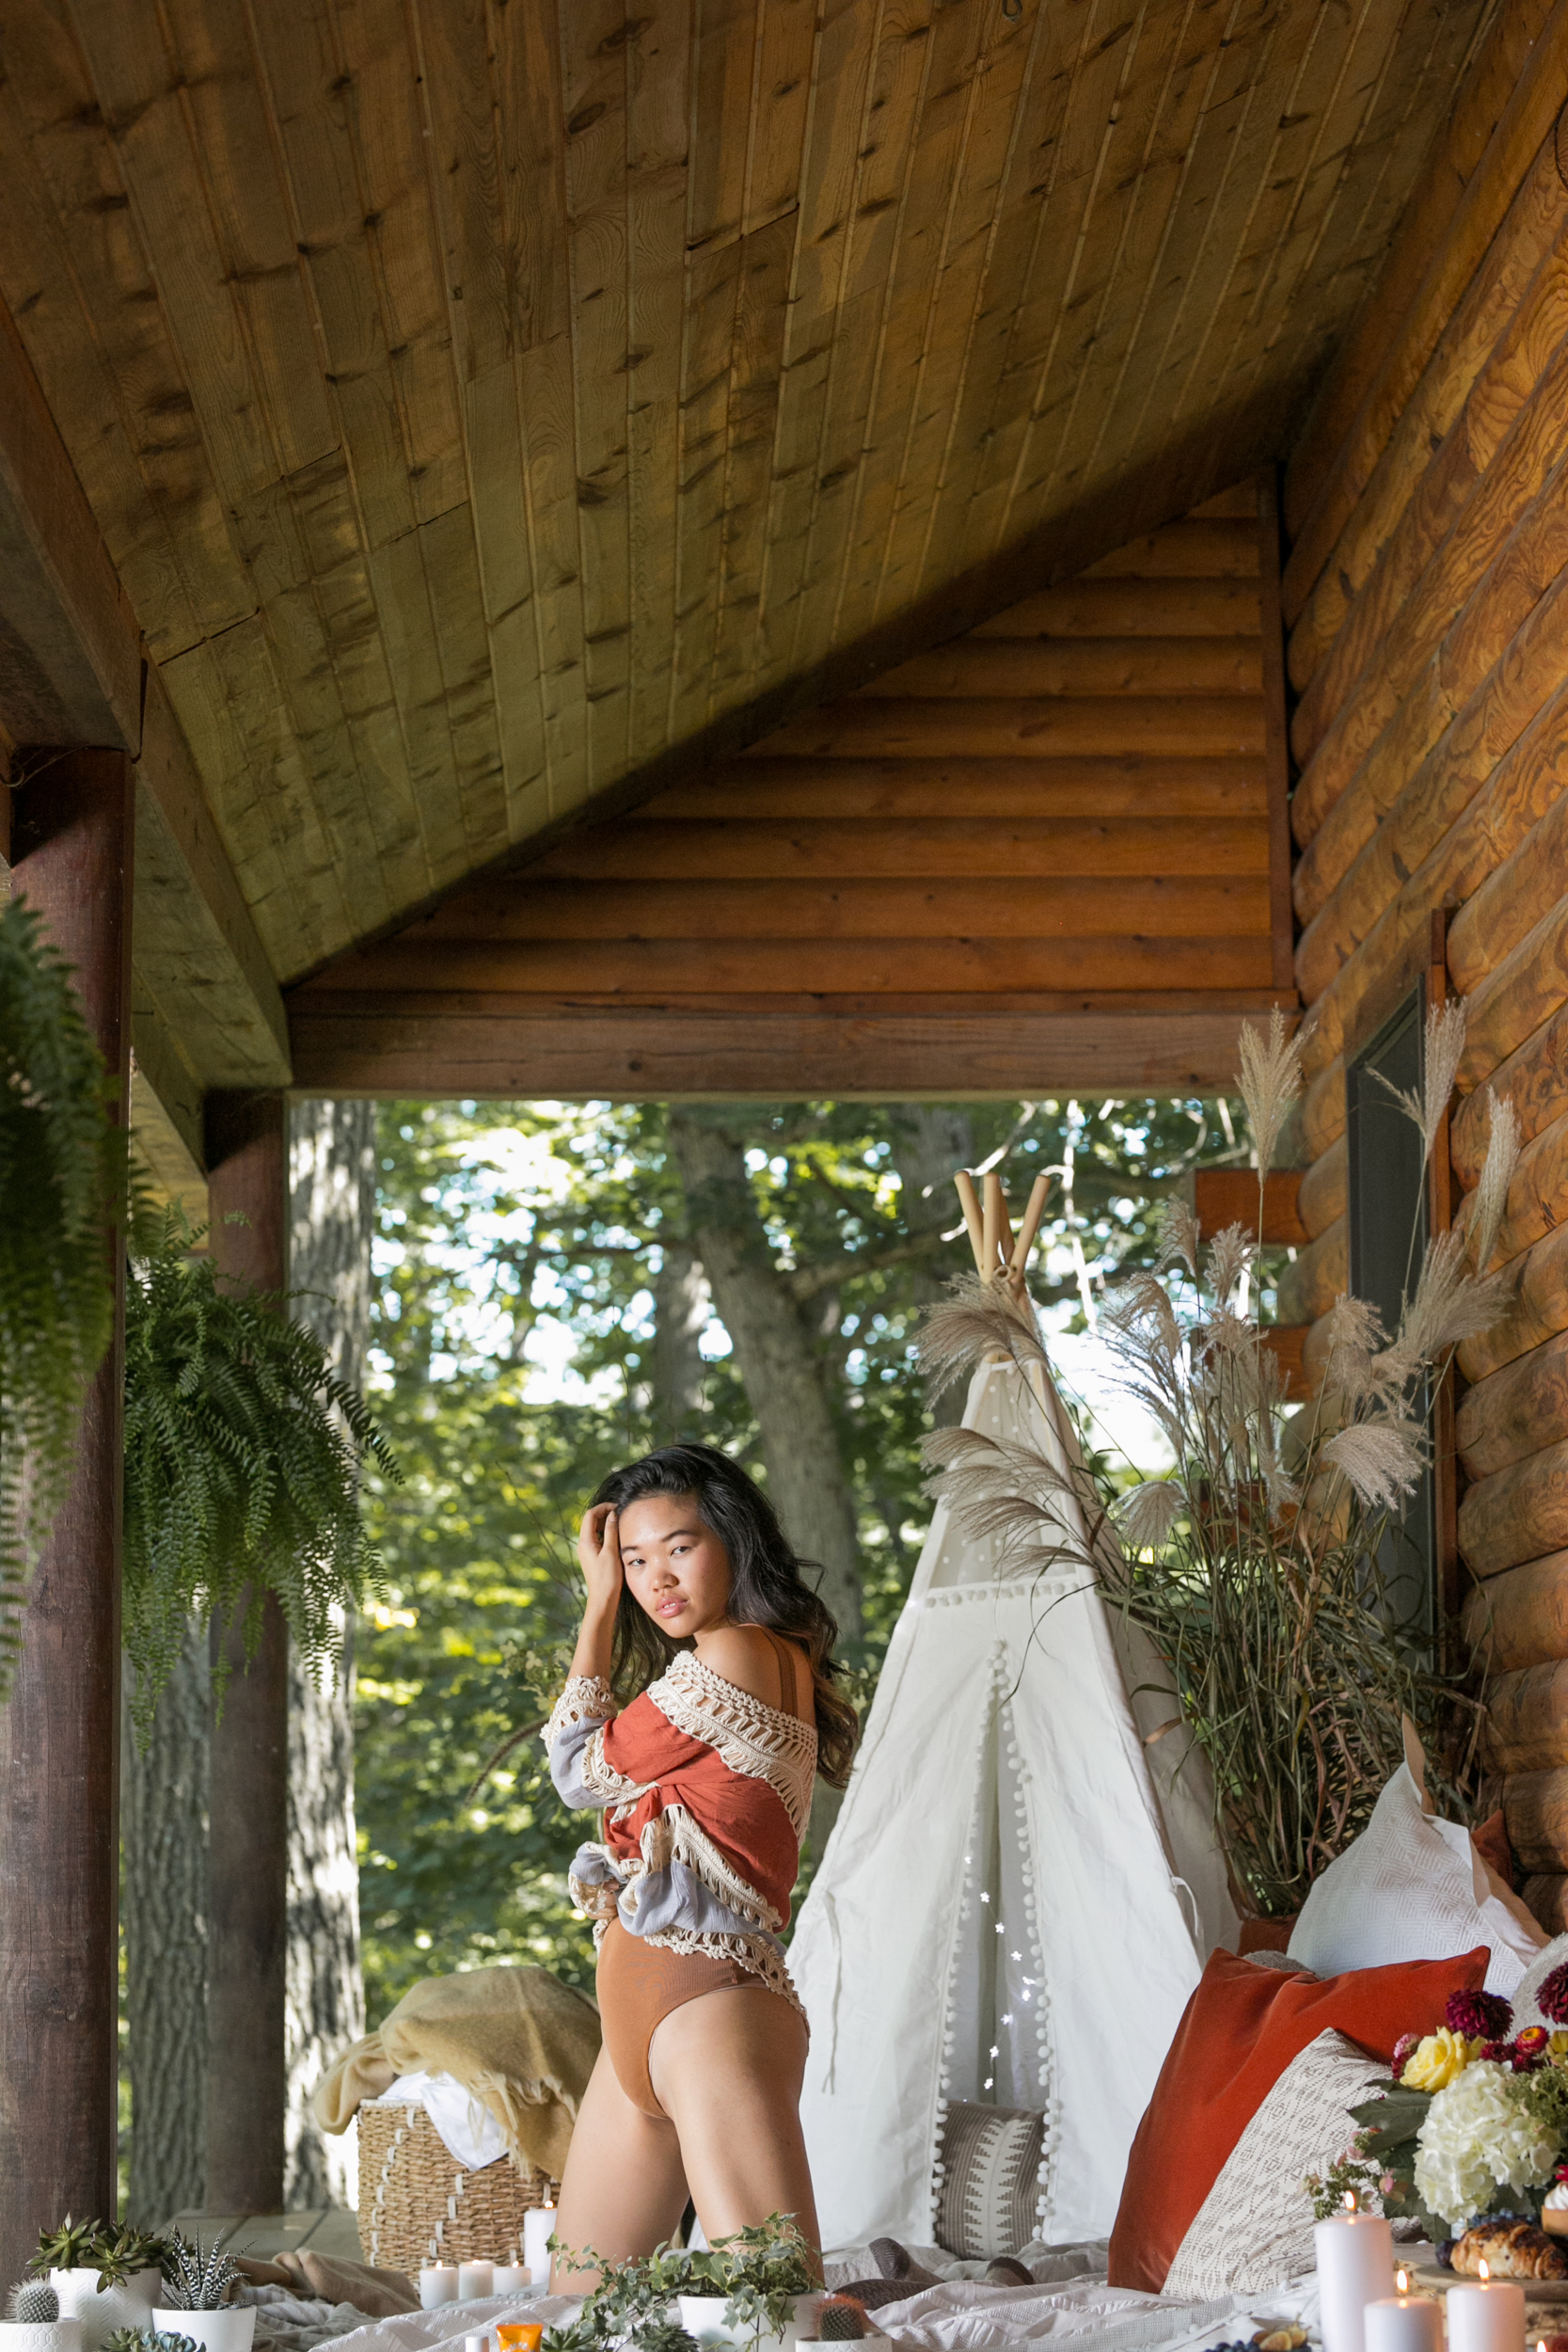 Lumene-USA-brand-campaign-photography-skincare-cabin-woods-organic-6.jpg